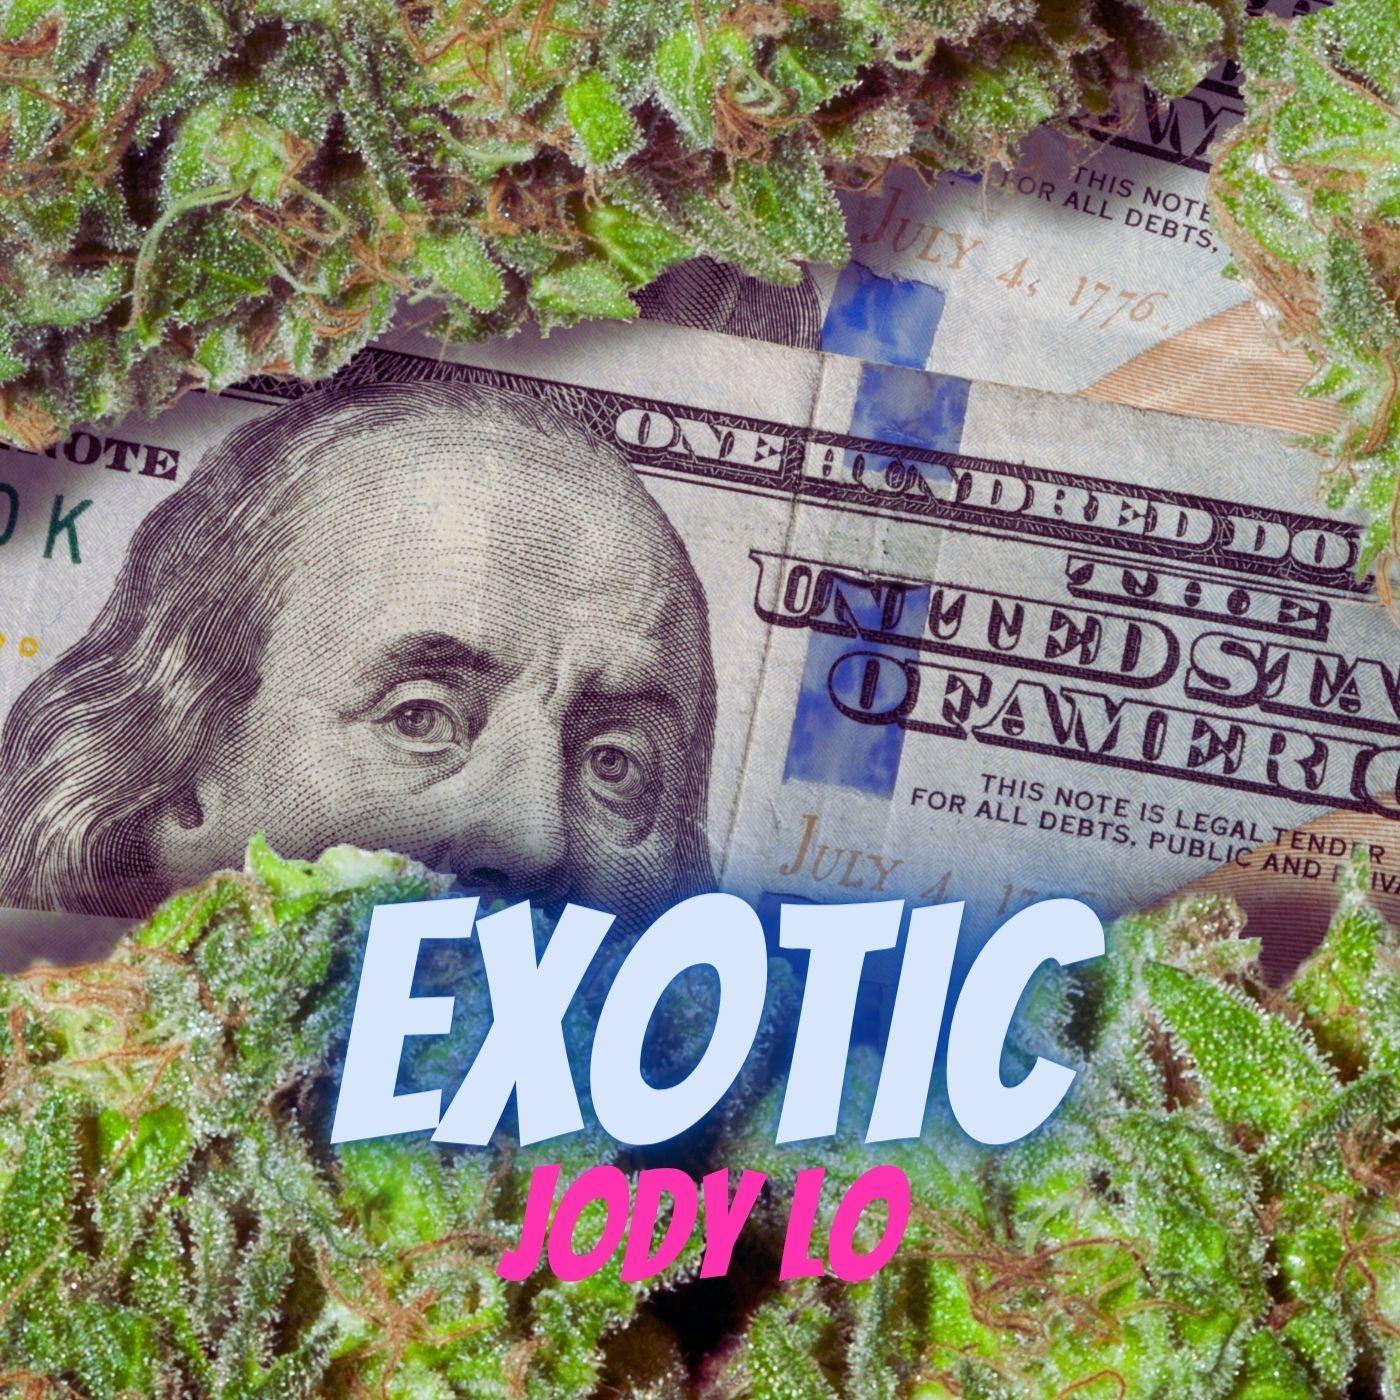 Jody Lo (@Jody__Lo) - Exotic